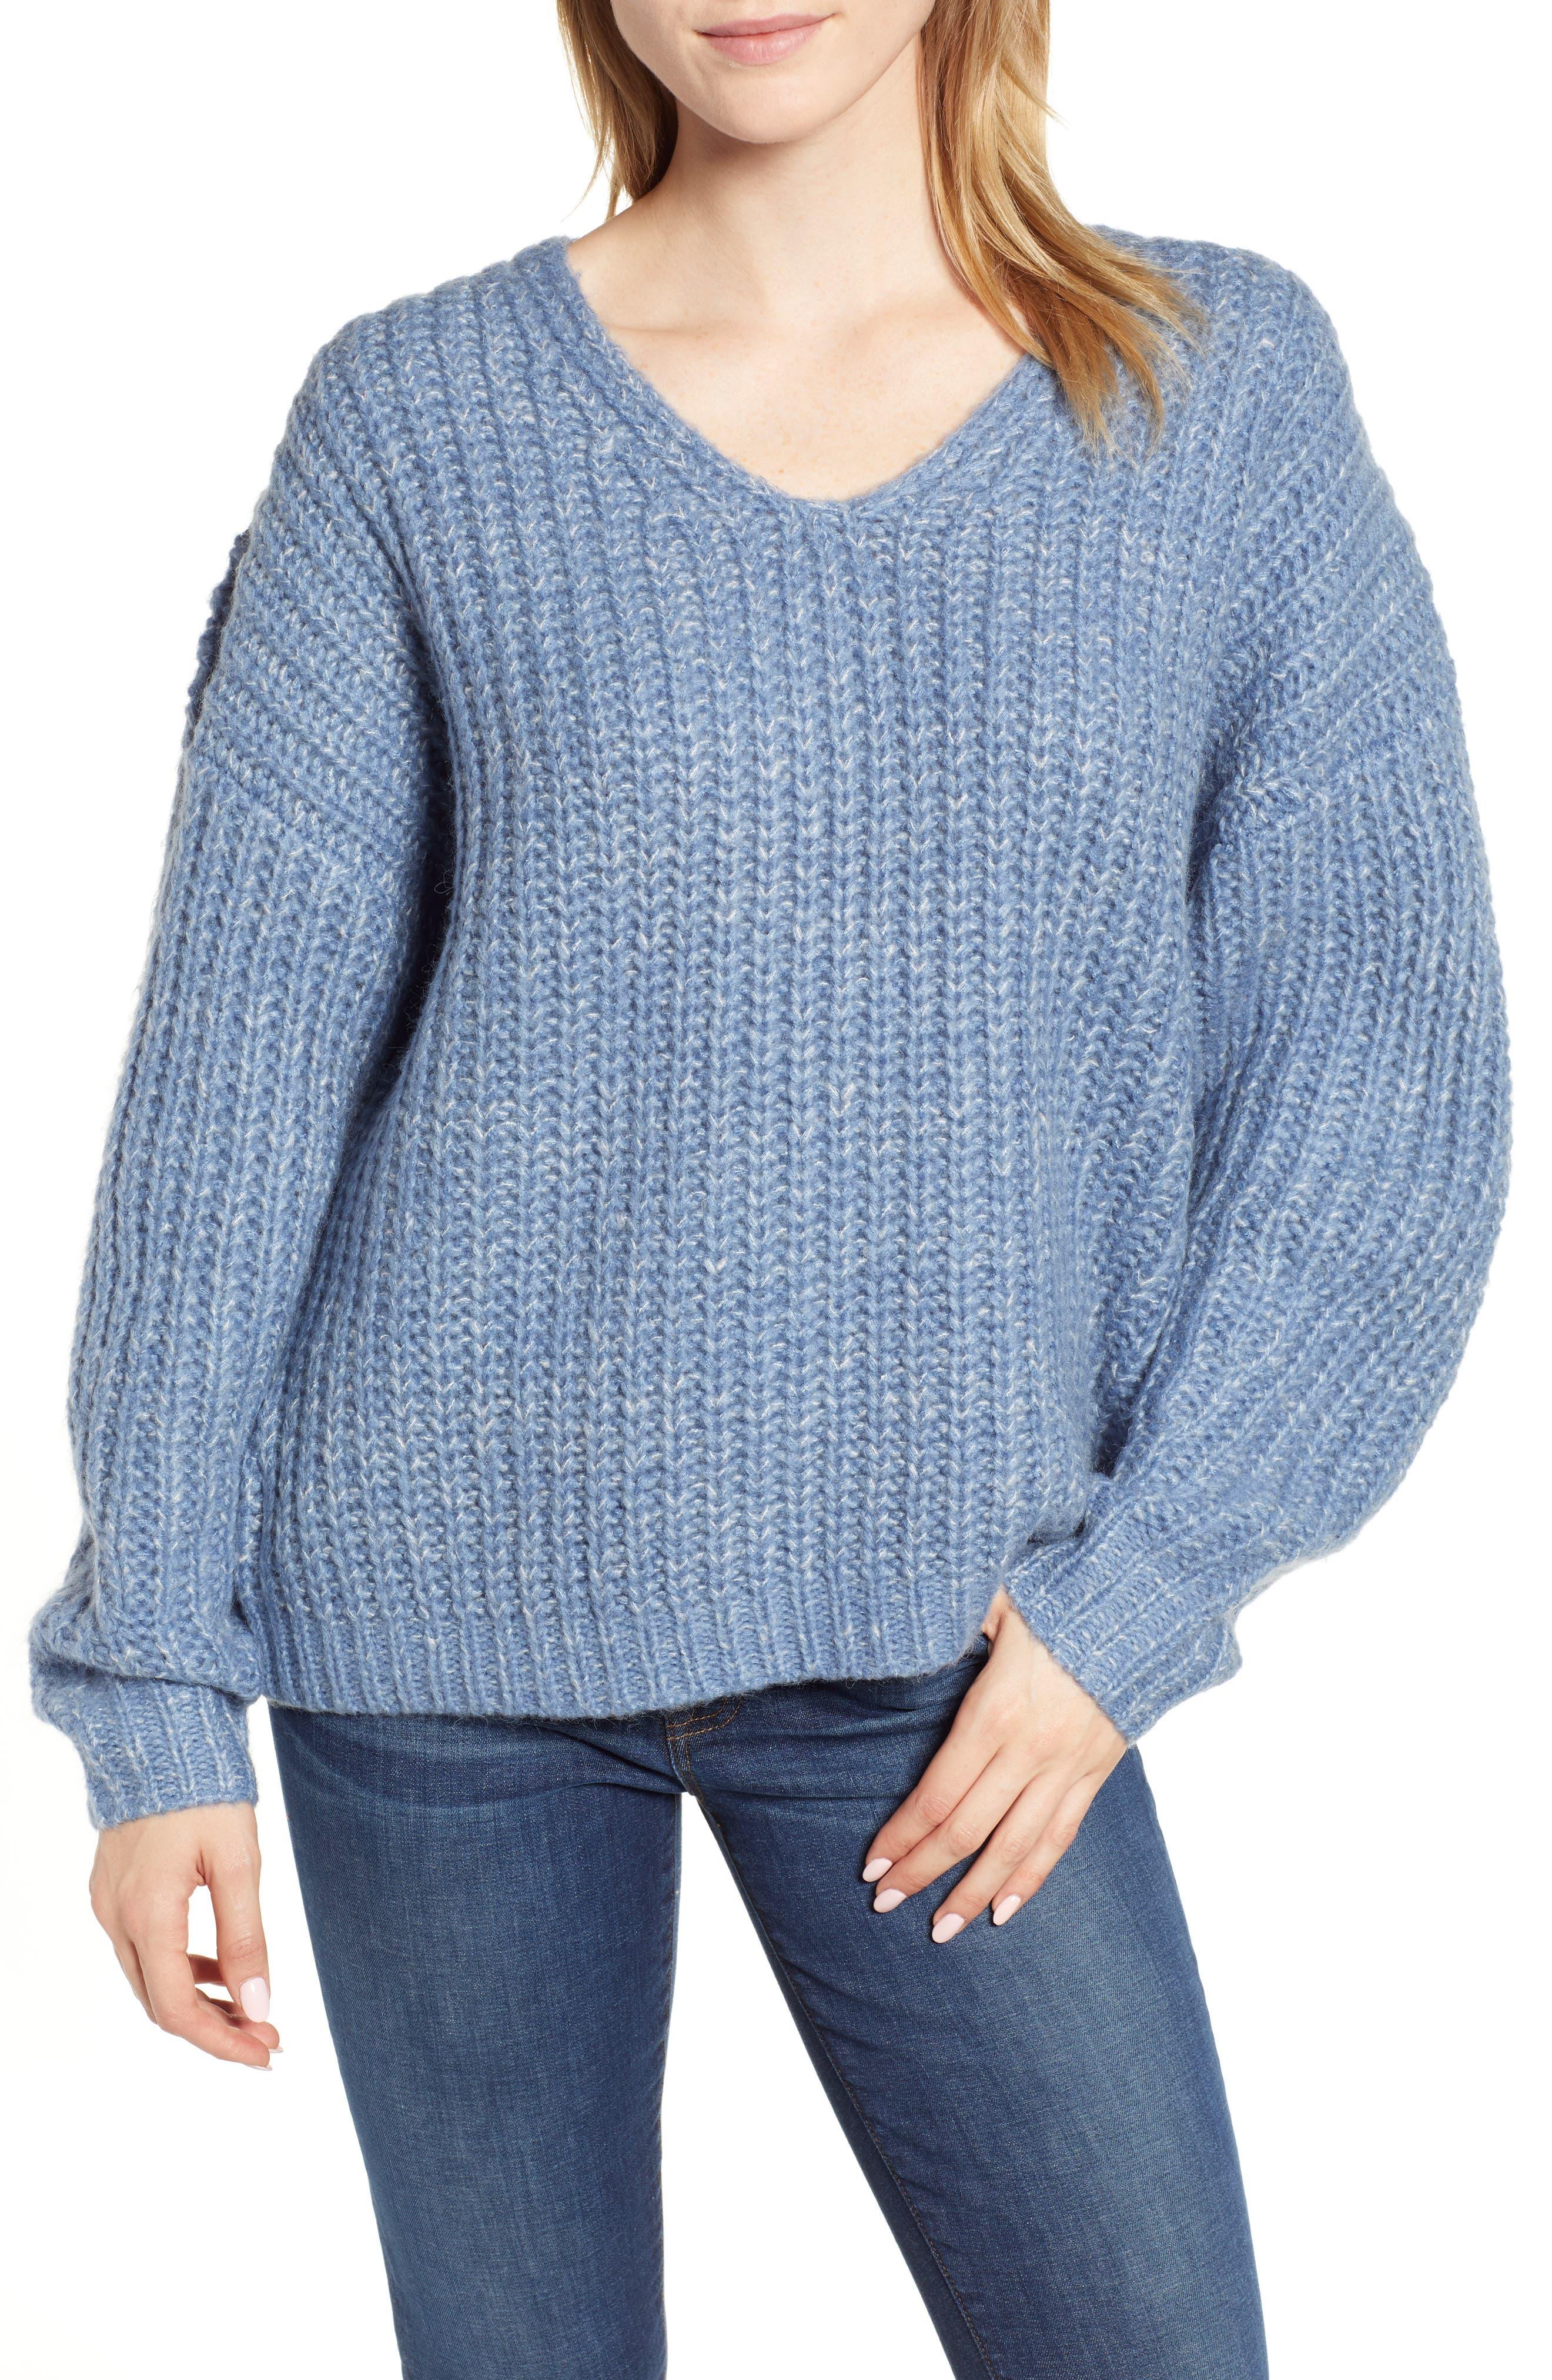 Dorit Sweater,                             Main thumbnail 1, color,                             BLUE